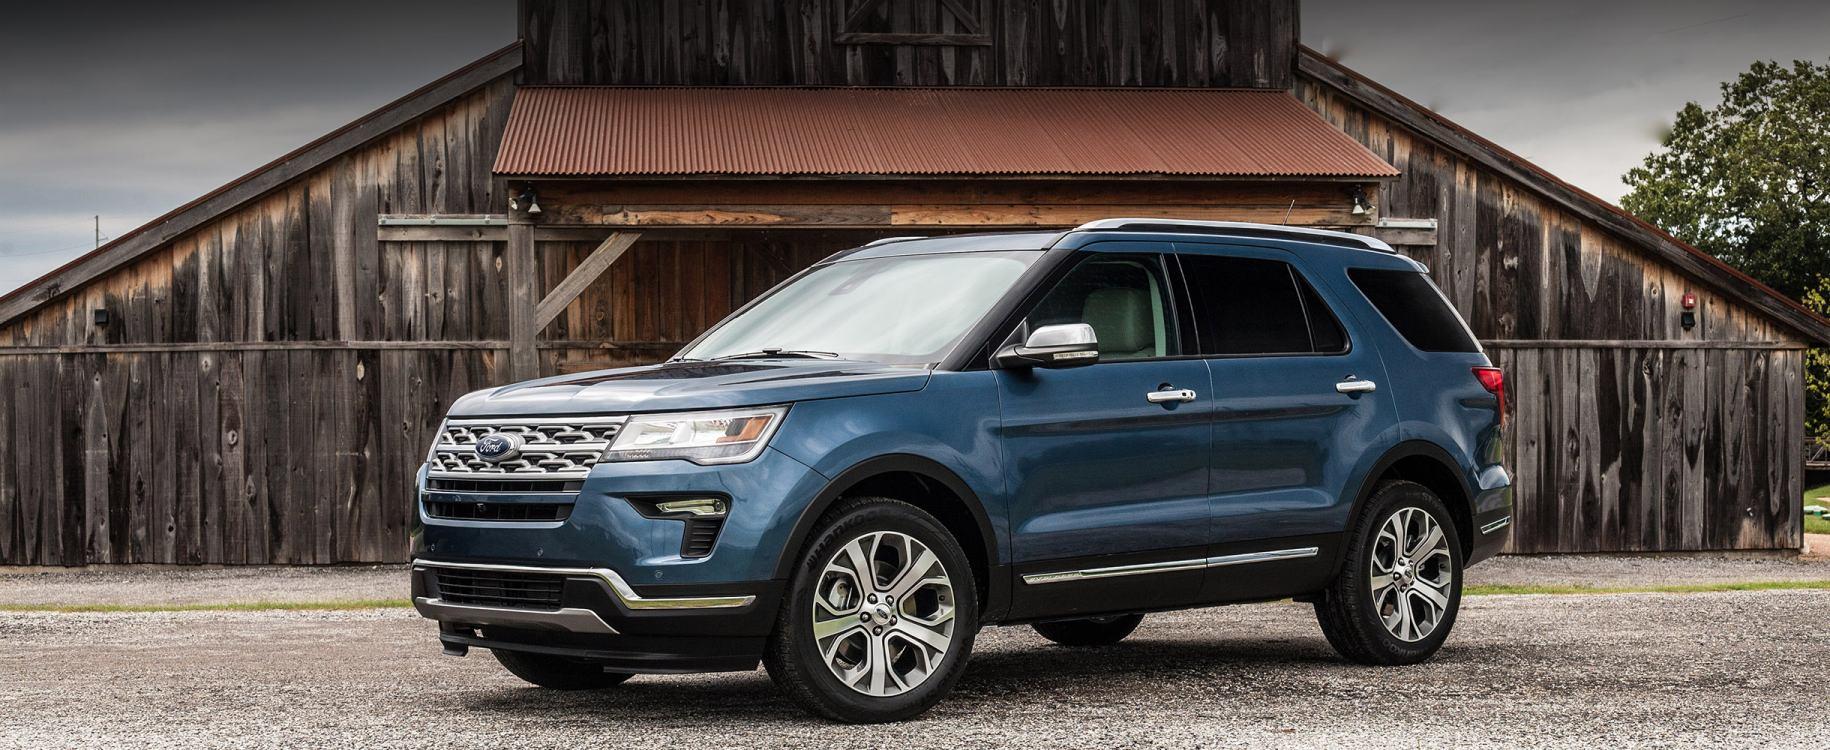 Elite 7 Seater Suv Rental Ford Explorer Or Similar Budget Rent A Car